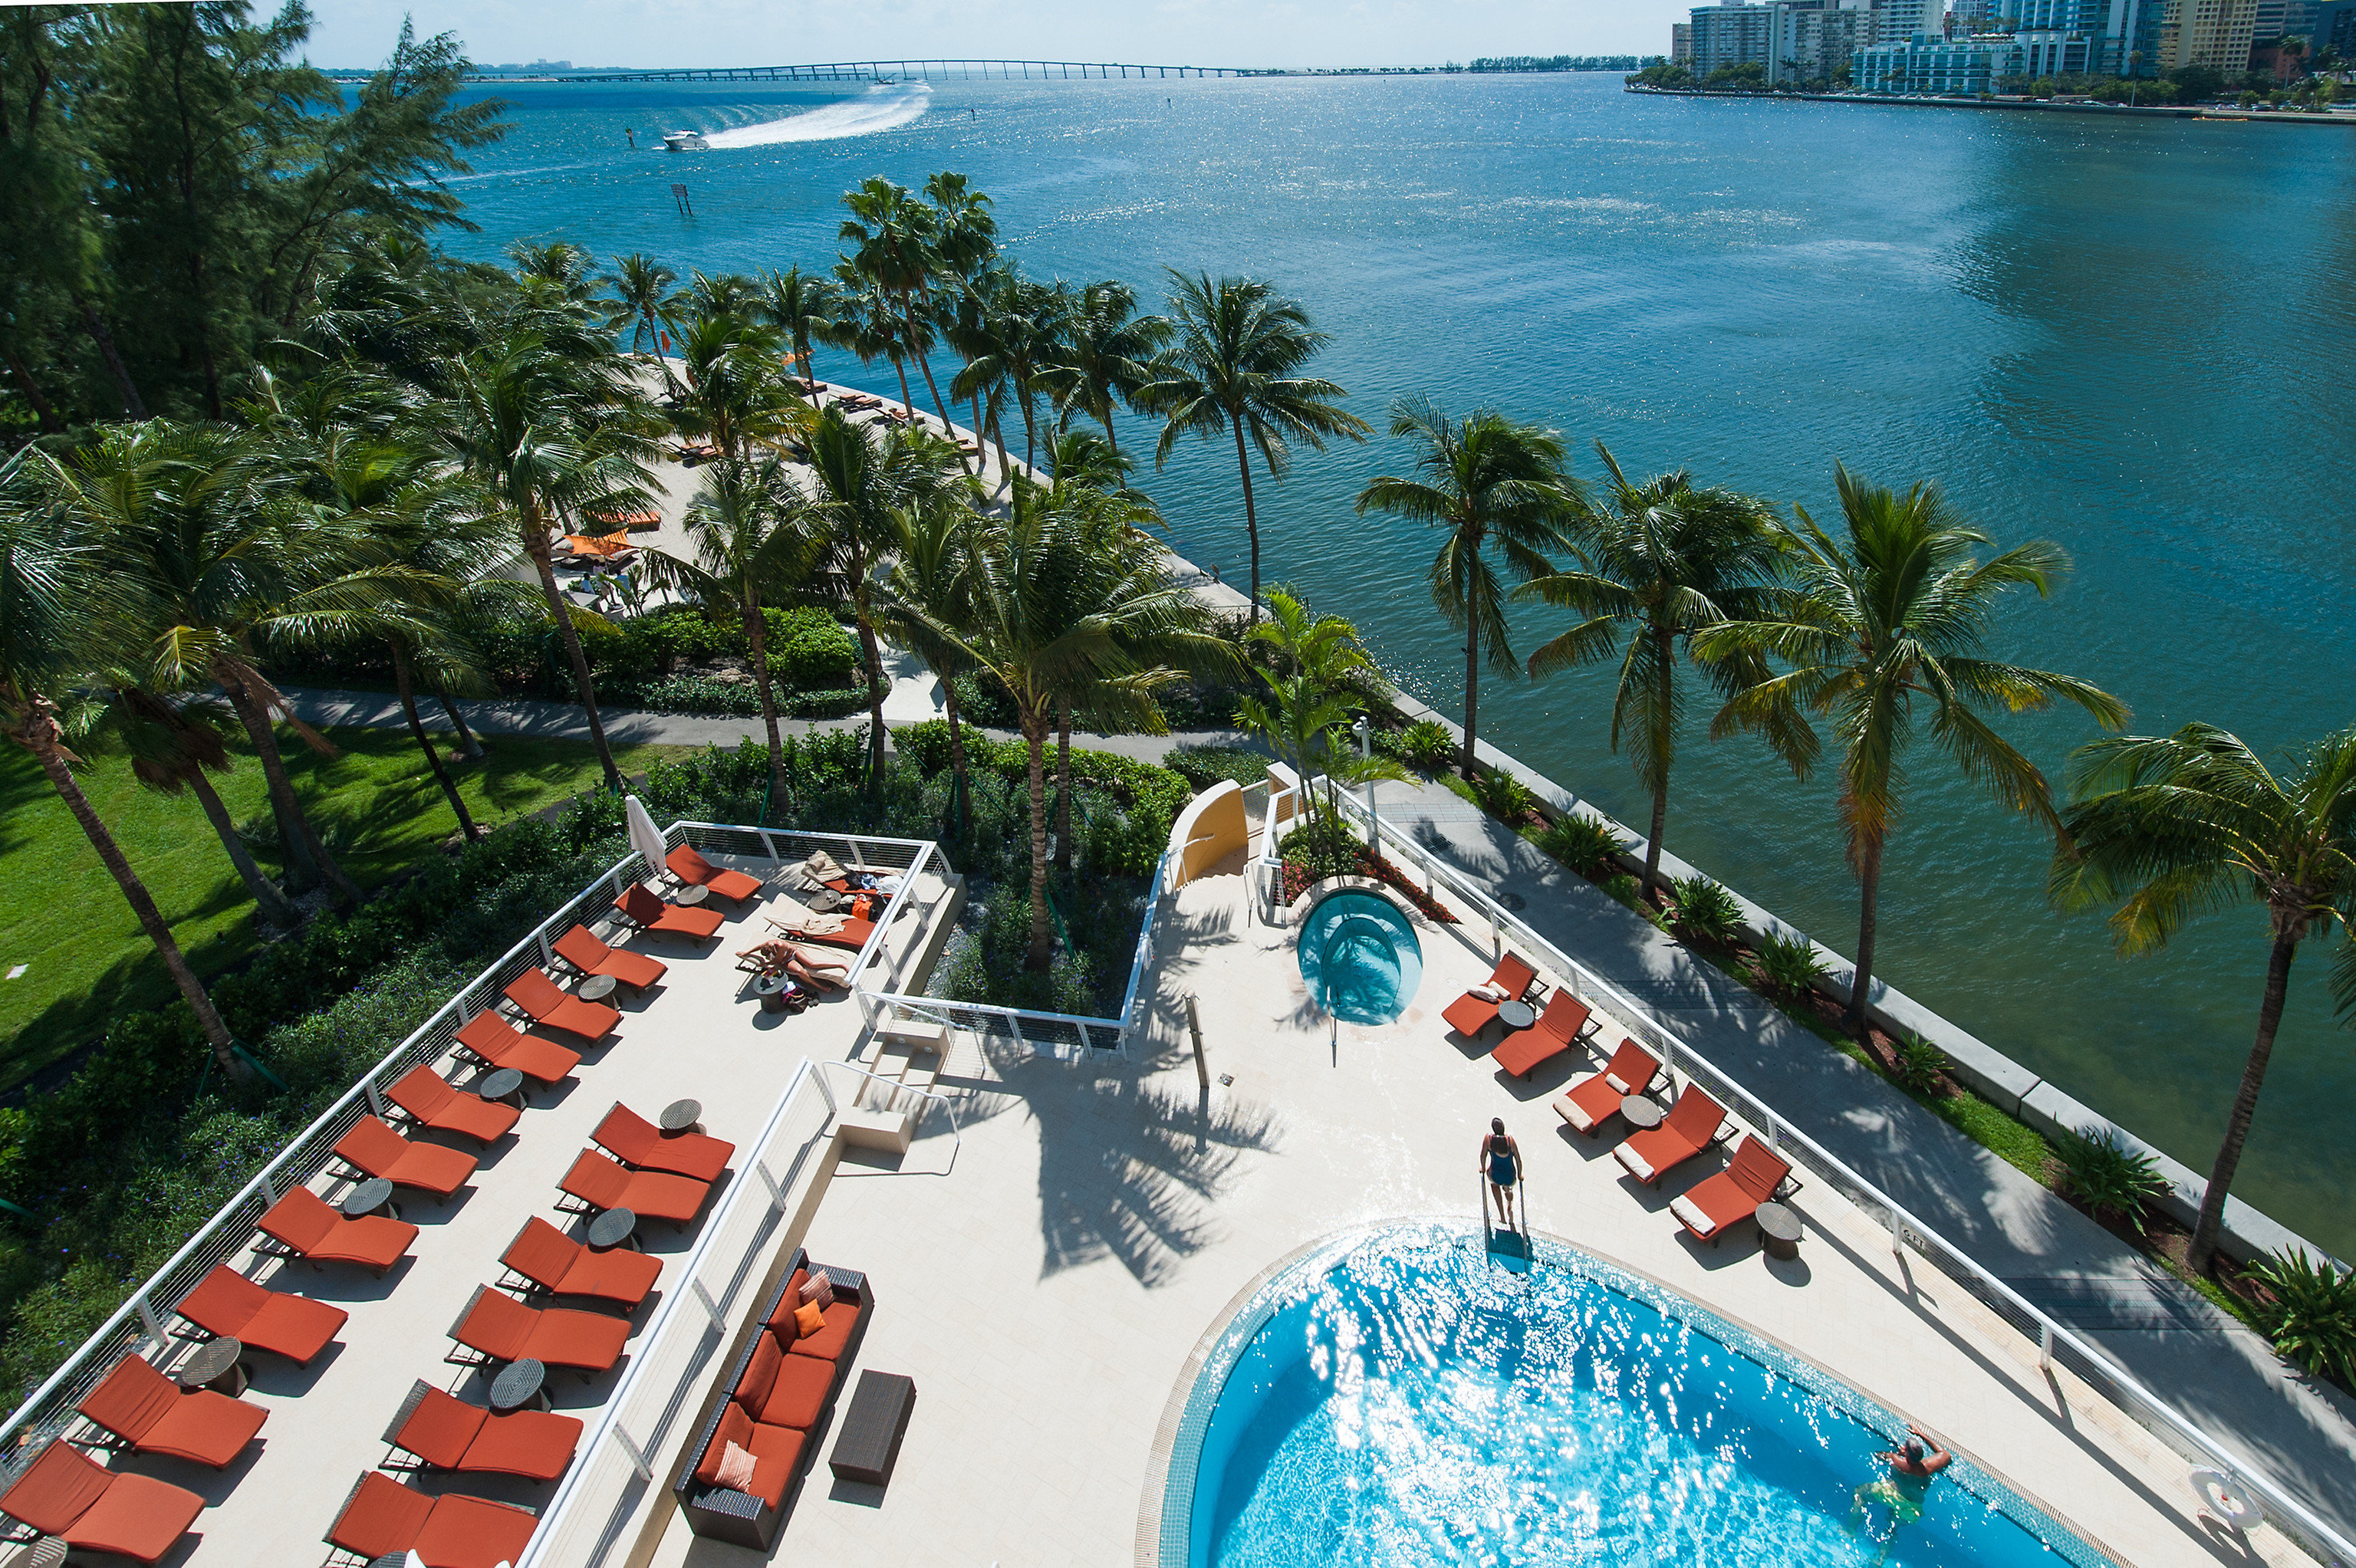 Resort leisure swimming pool resort town tropics palm tree arecales tree caribbean Sea travel recreation coastal and oceanic landforms Lagoon Beach plant